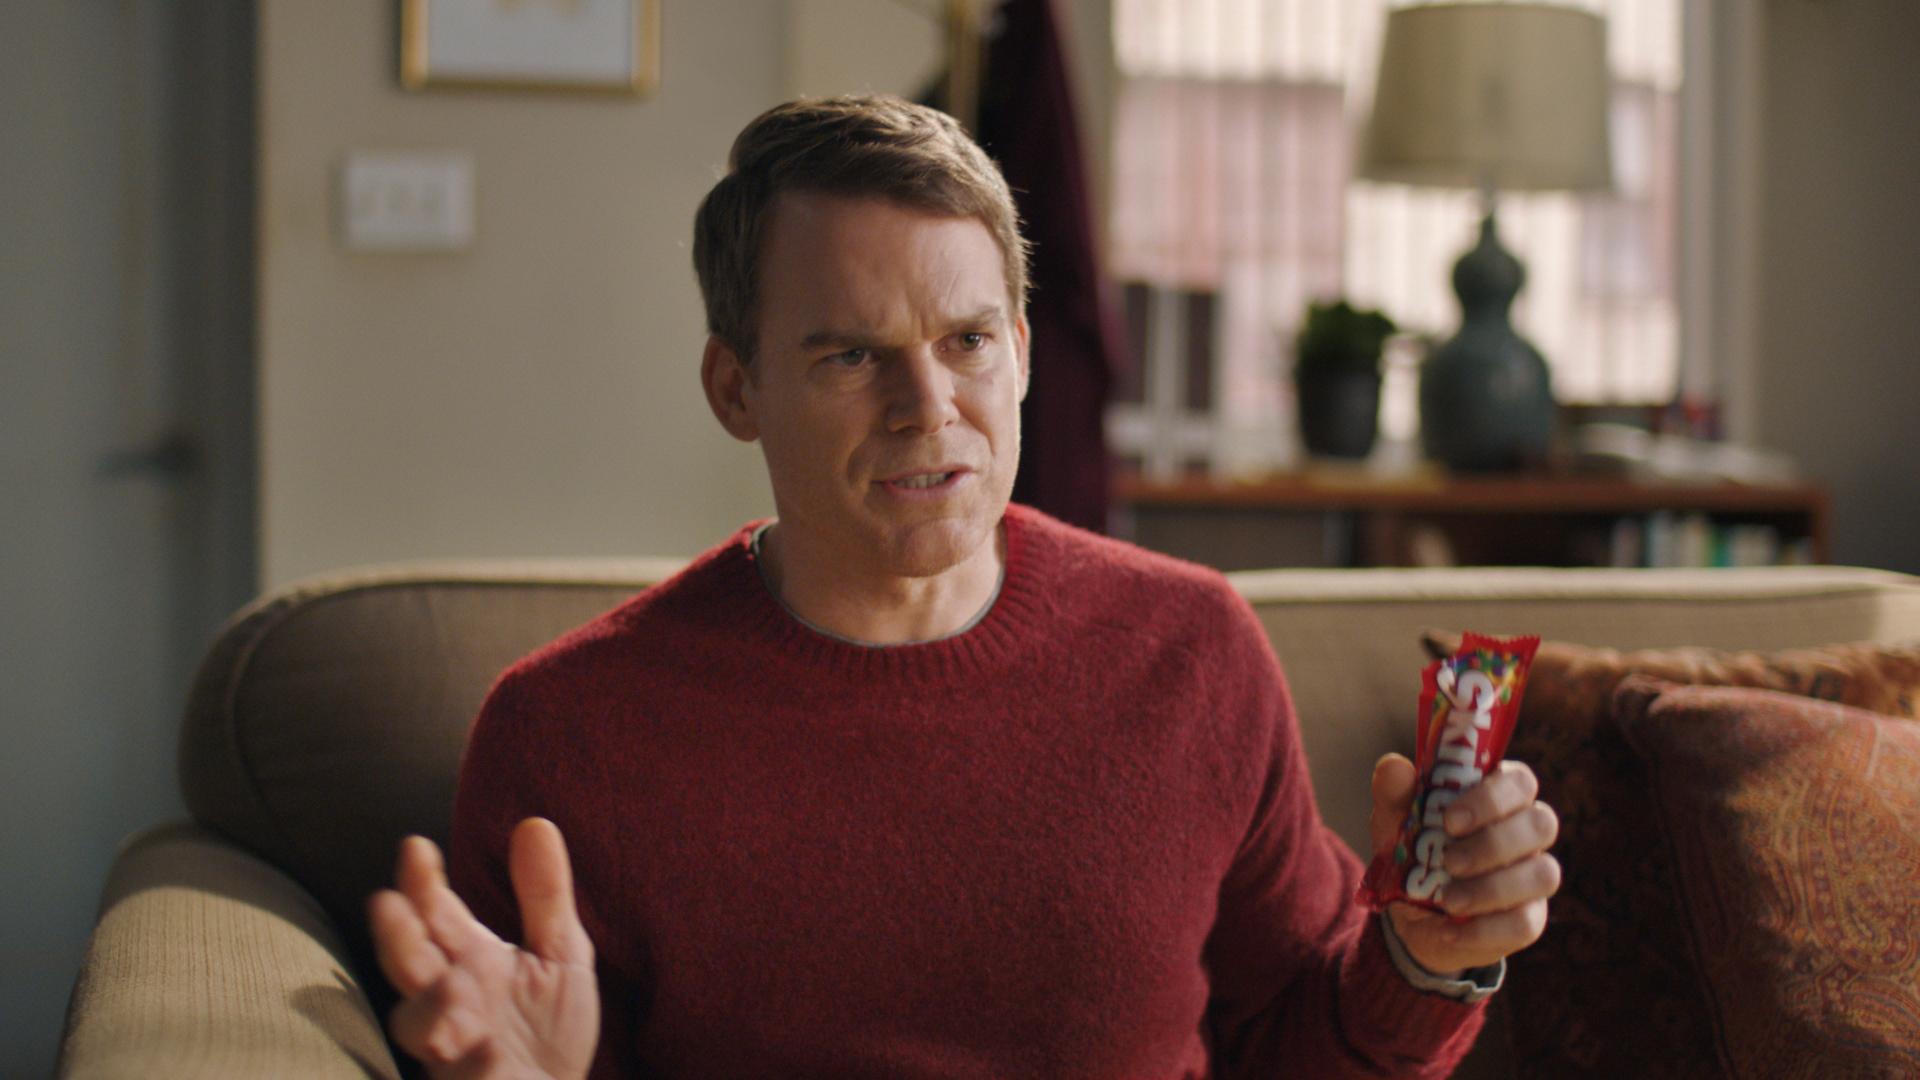 Skittles' 2019 Super Bowl Commercial: Michael C  Hall Musical